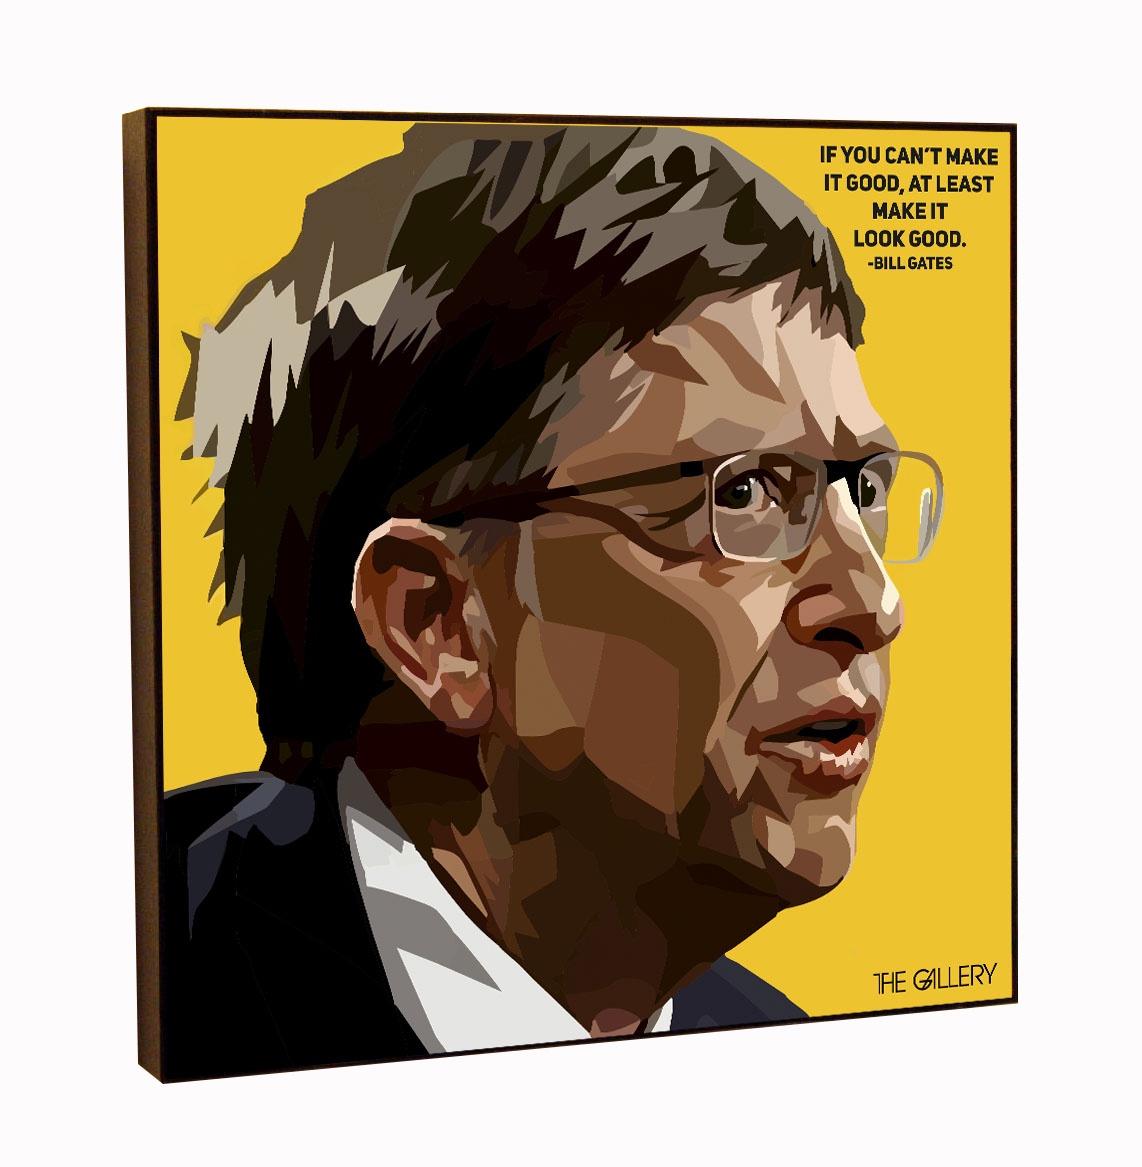 Постер The Gallery Картина Билл Гейтс в стиле поп-арт 25 х 25 см, принт + МДФ, Оргалит думай как билл гейтс